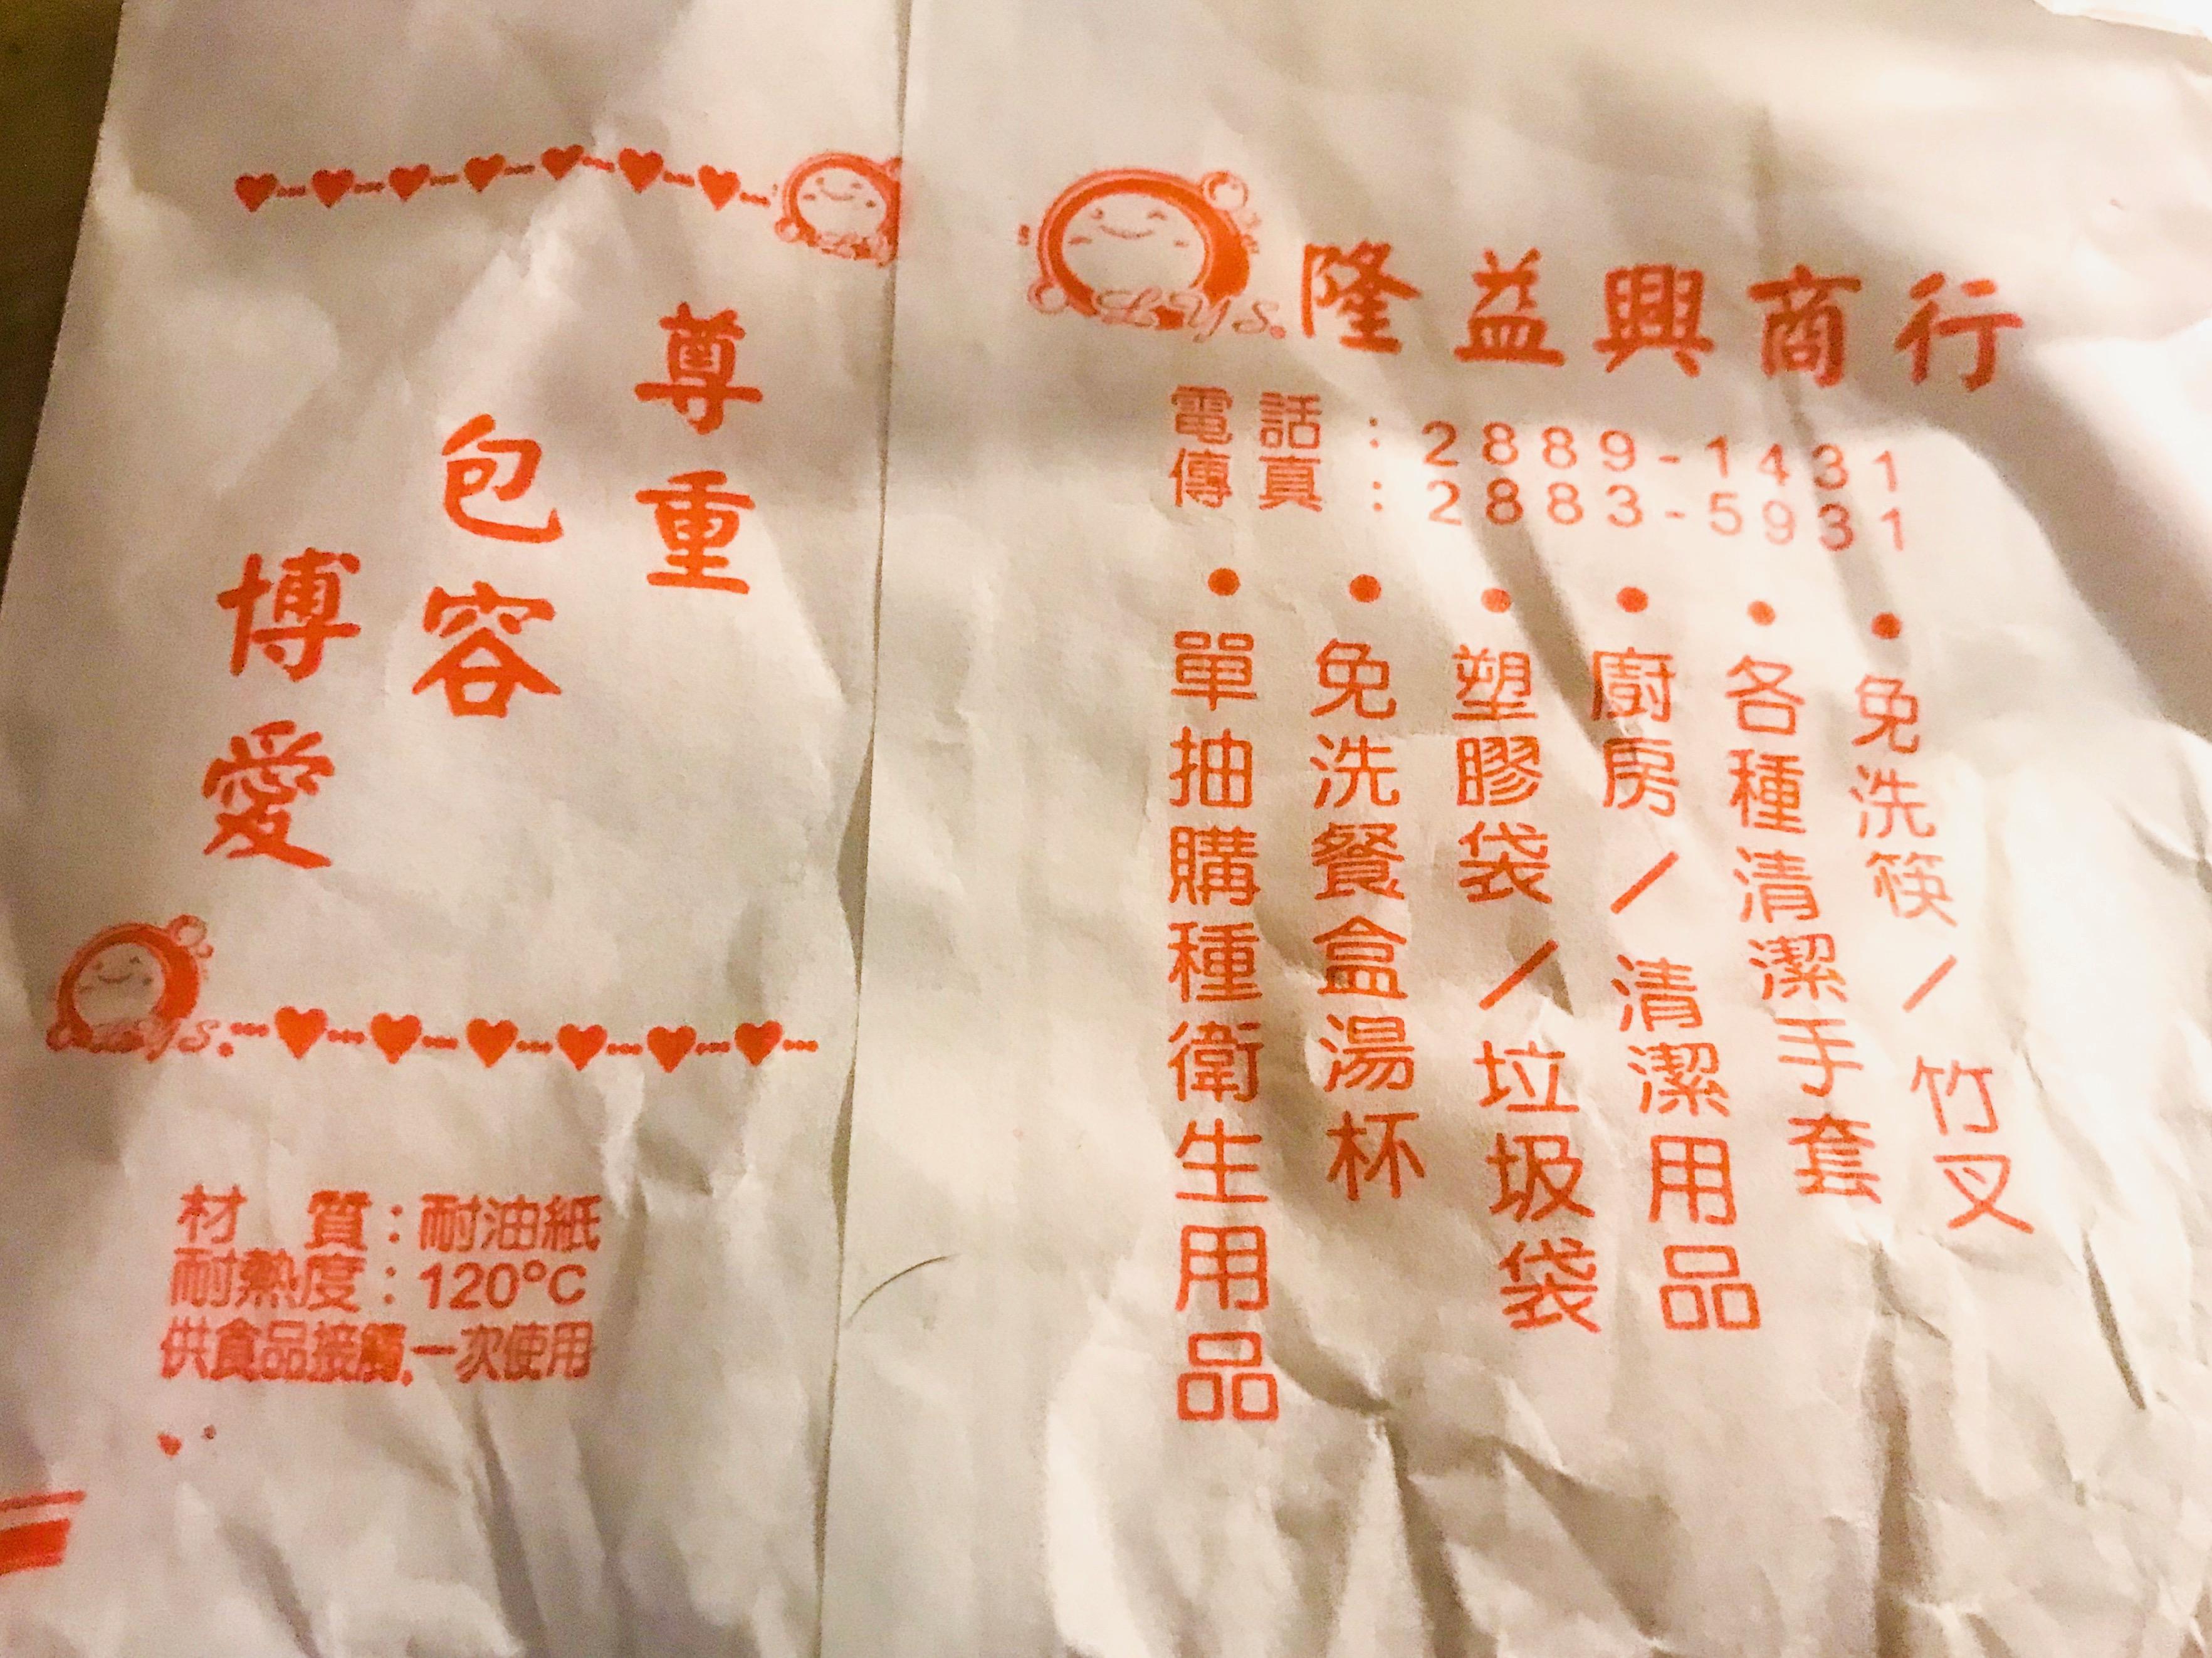 台湾食べ歩き士林夜市 大腸包小腸